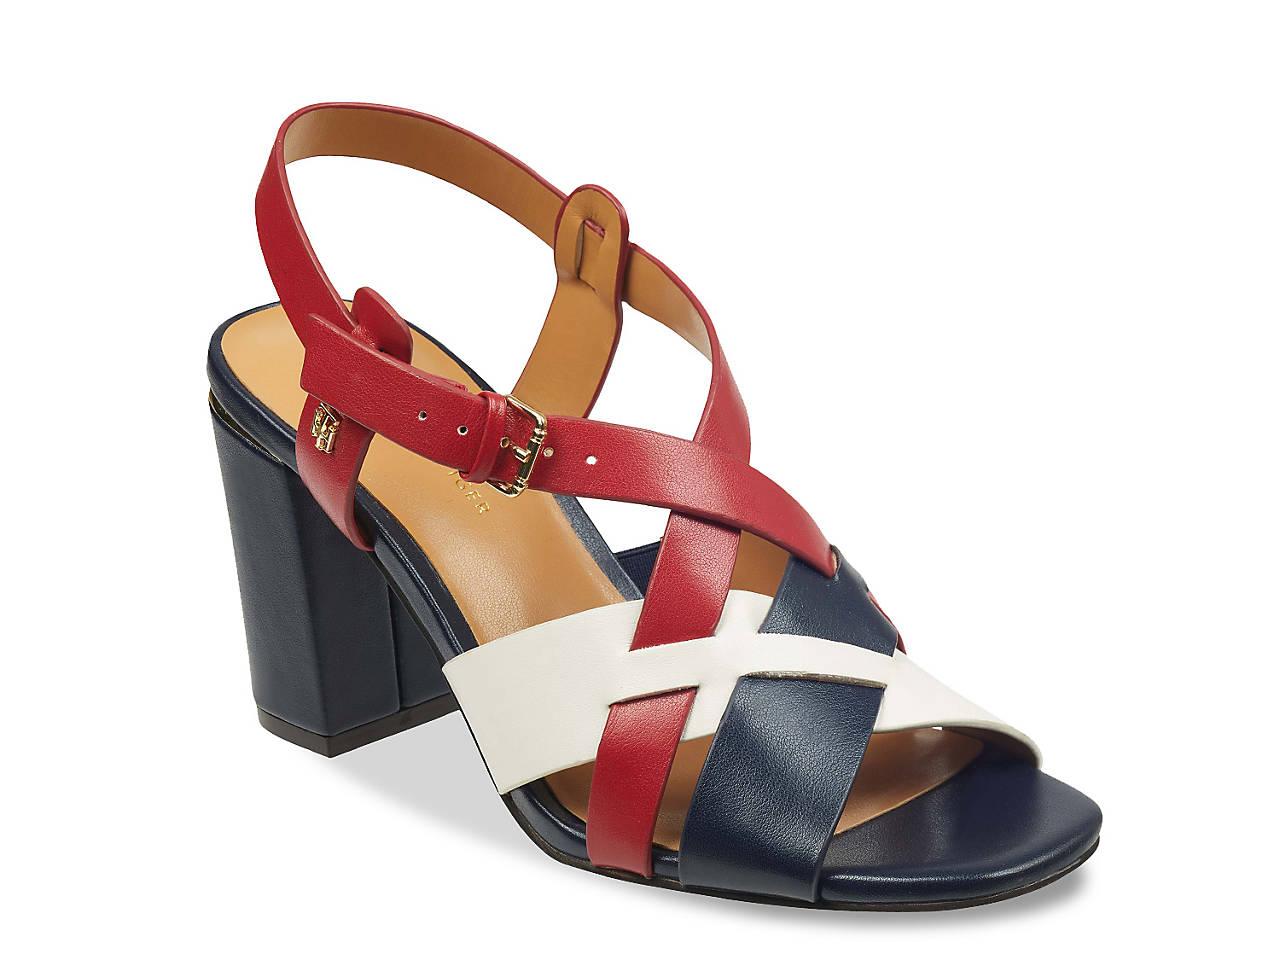 97c776da Tommy Hilfiger Graysi 2 Sandal Women's Shoes | DSW